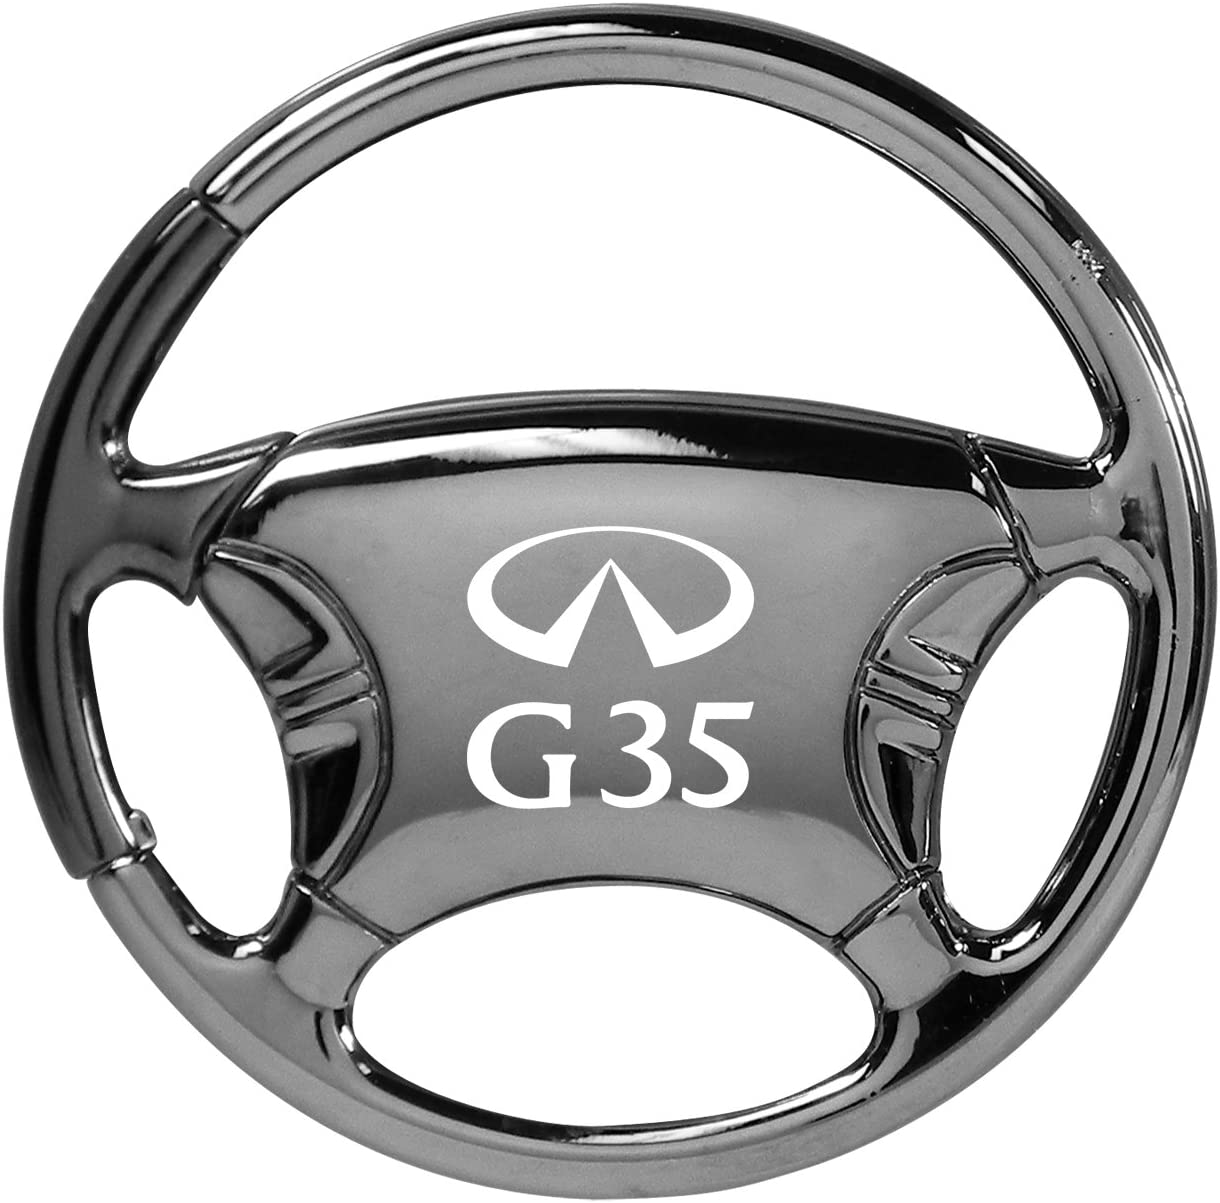 Infiniti G35 Black Chrome Steering Wheel Key Chain